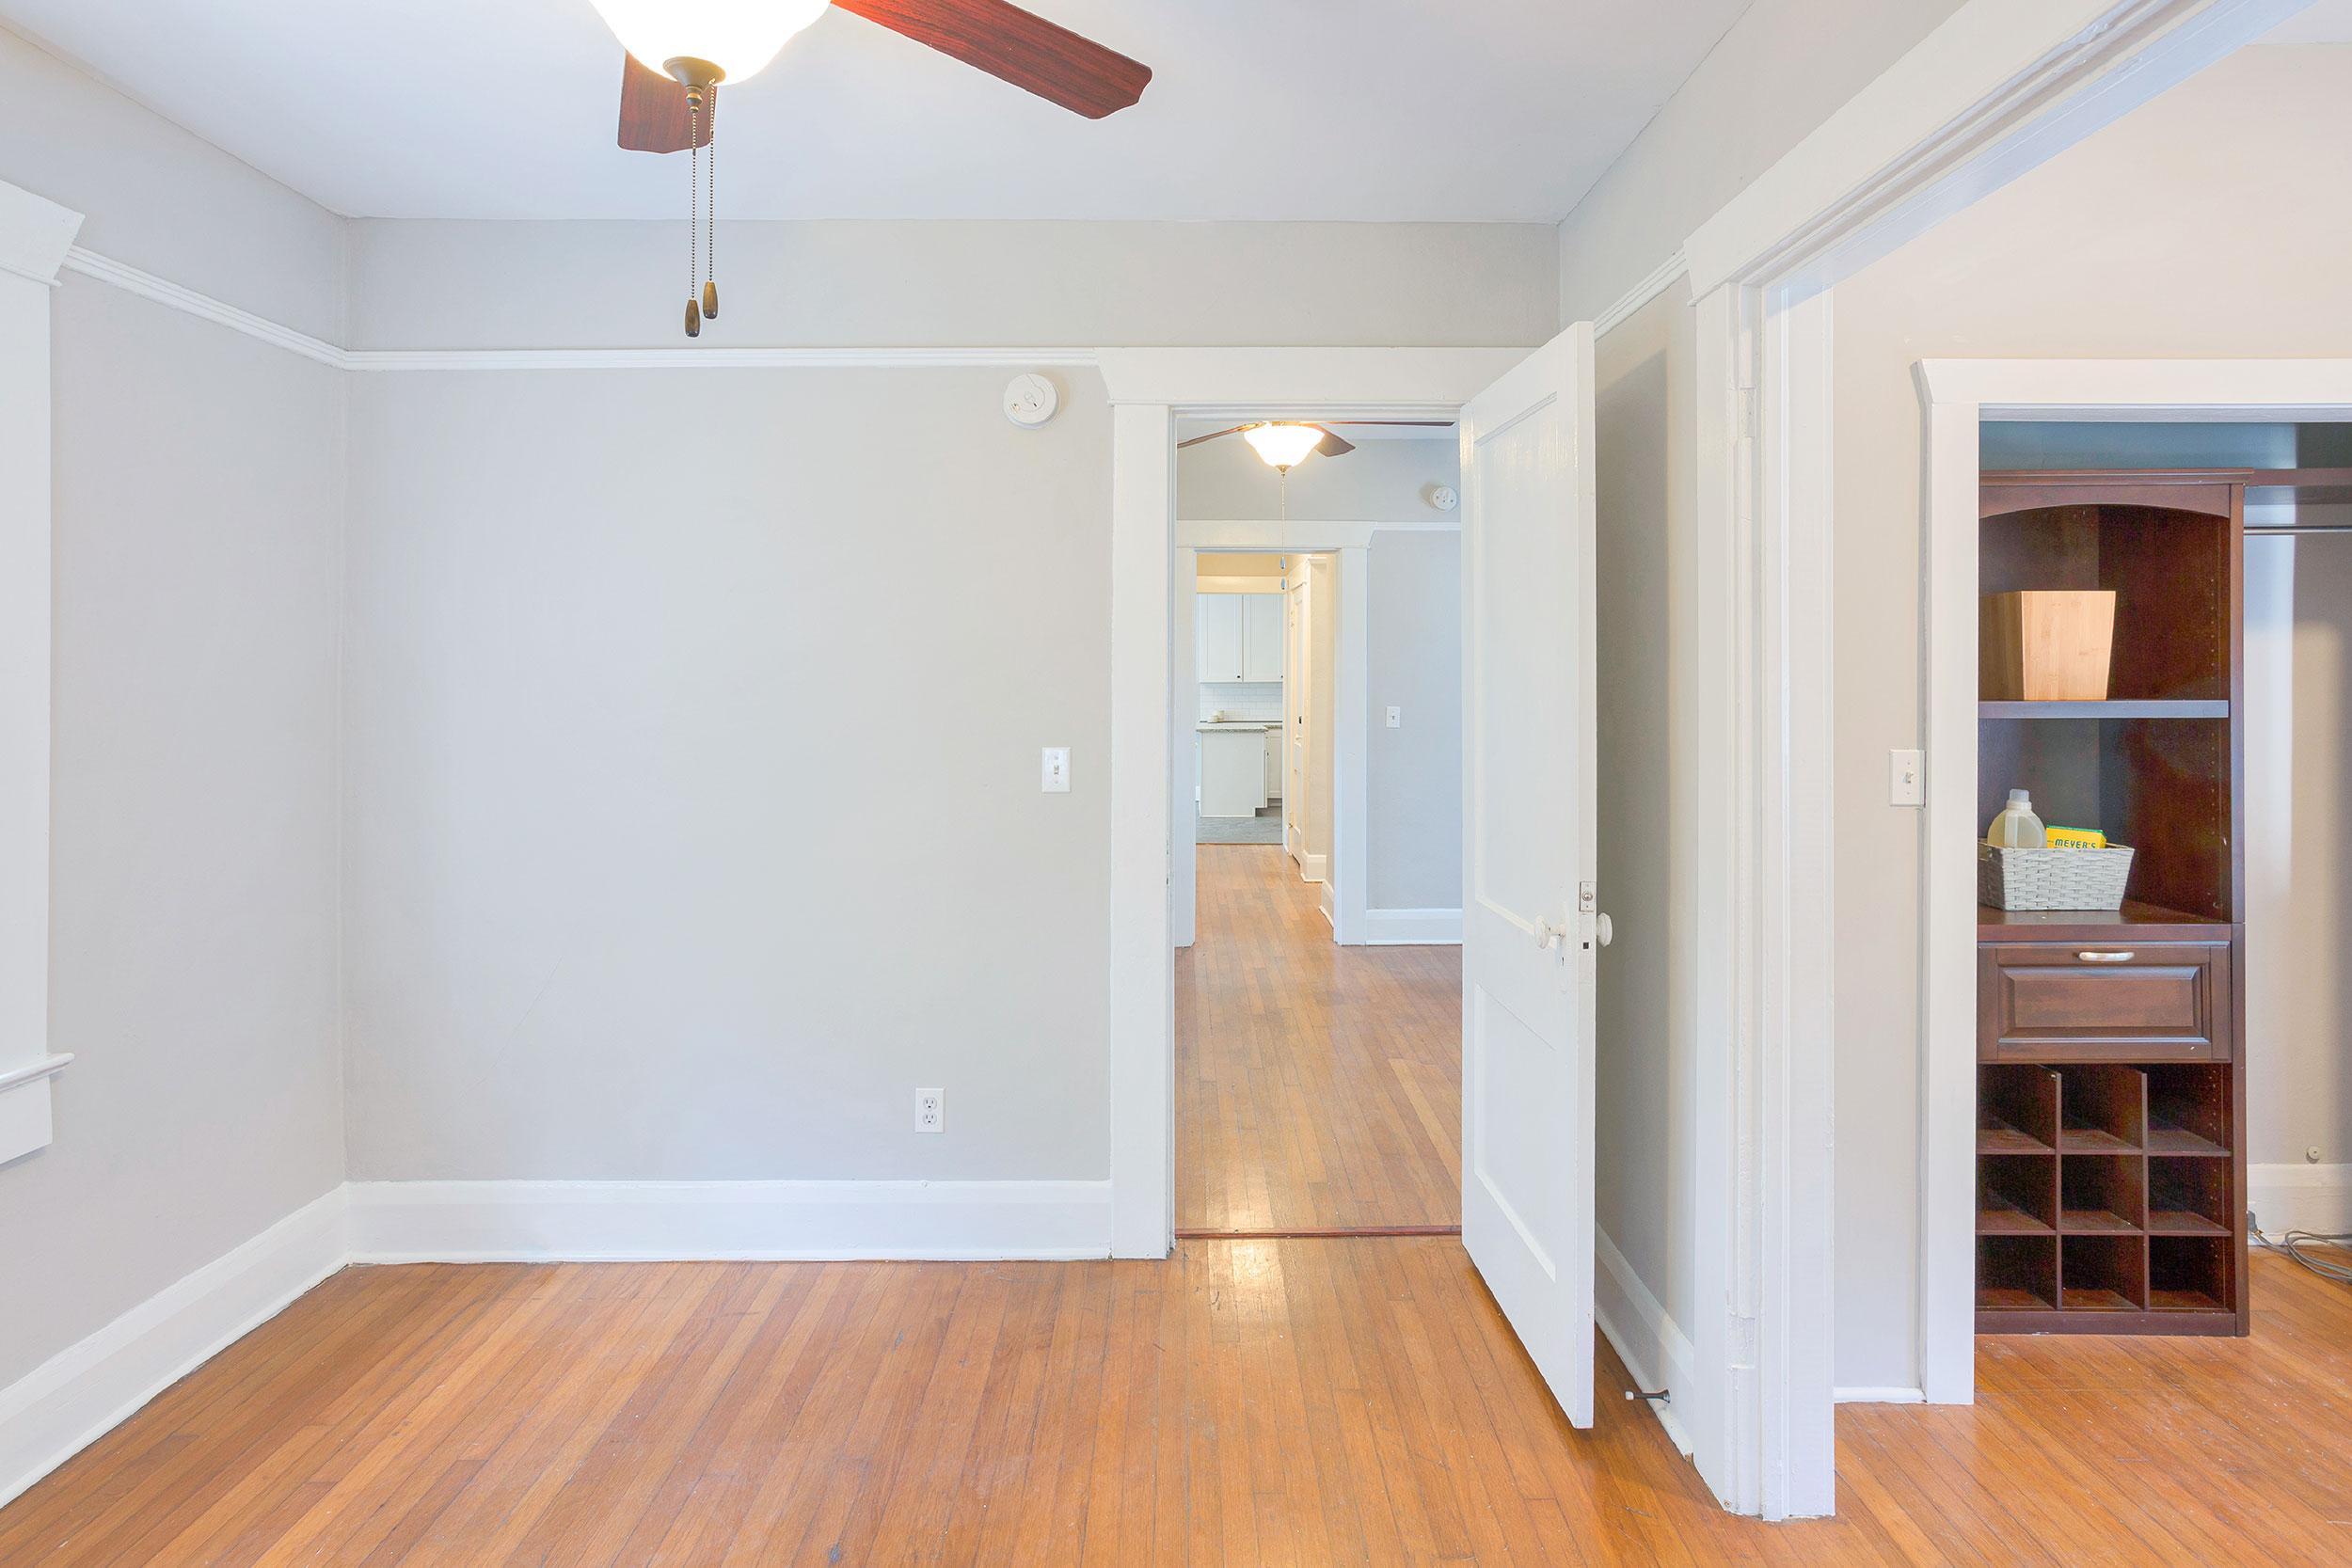 Plf-bedroom